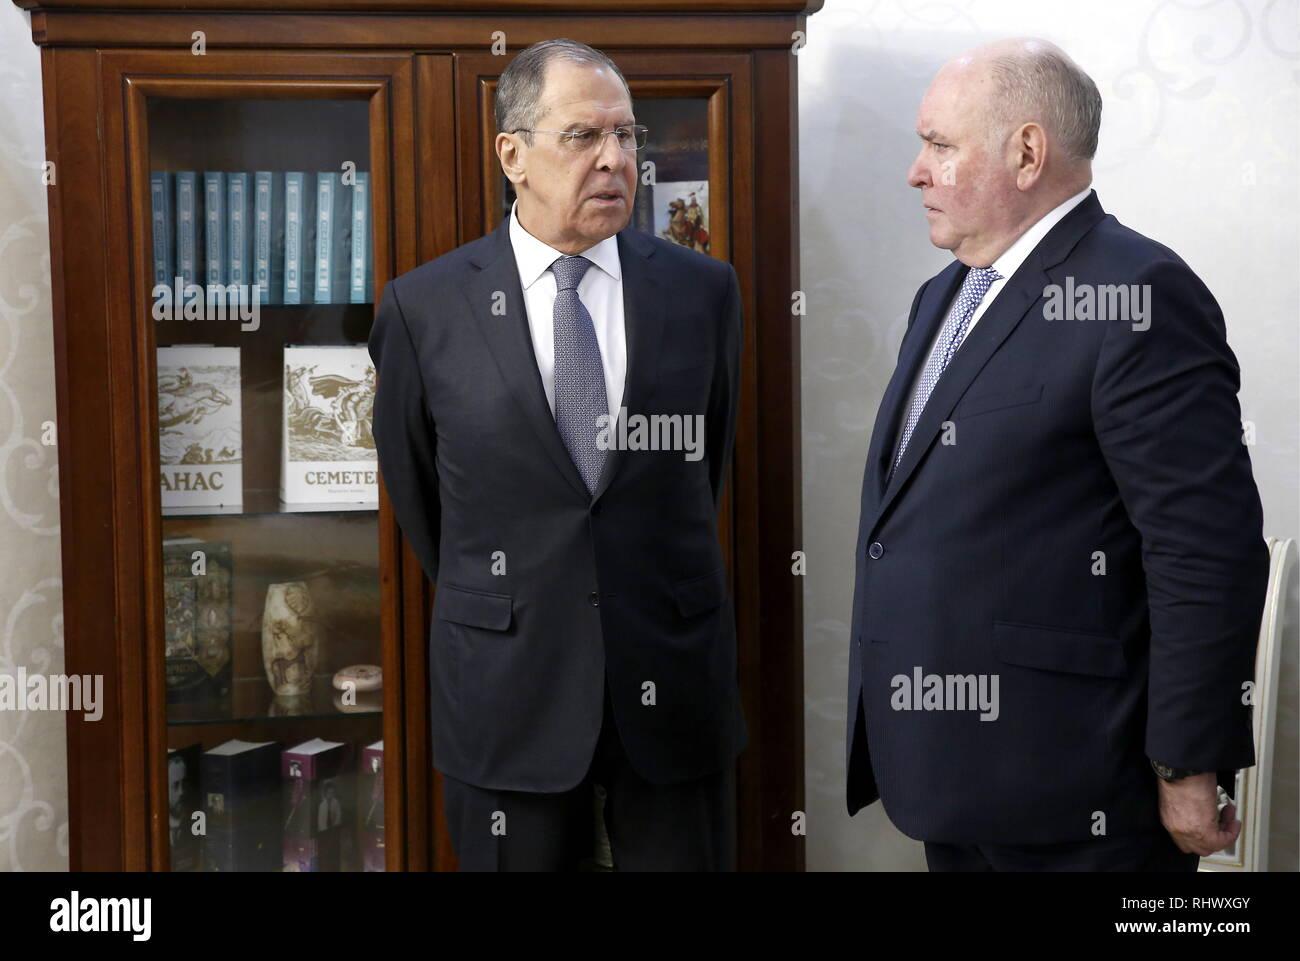 Bishkek, Kyrgyzstan. 04th Feb, 2019. BISHKEK, KYRGYZSTAN - FEBRUARY 4, 2019: Russia's Foreign Minister Sergei Lavrov (L) and his deputy Grigory Karasin ahead of a meeting with Kyrgyzstan's President Sooronbay Jeenbekov. Alexander Shcherbak/TASS Credit: ITAR-TASS News Agency/Alamy Live News - Stock Image